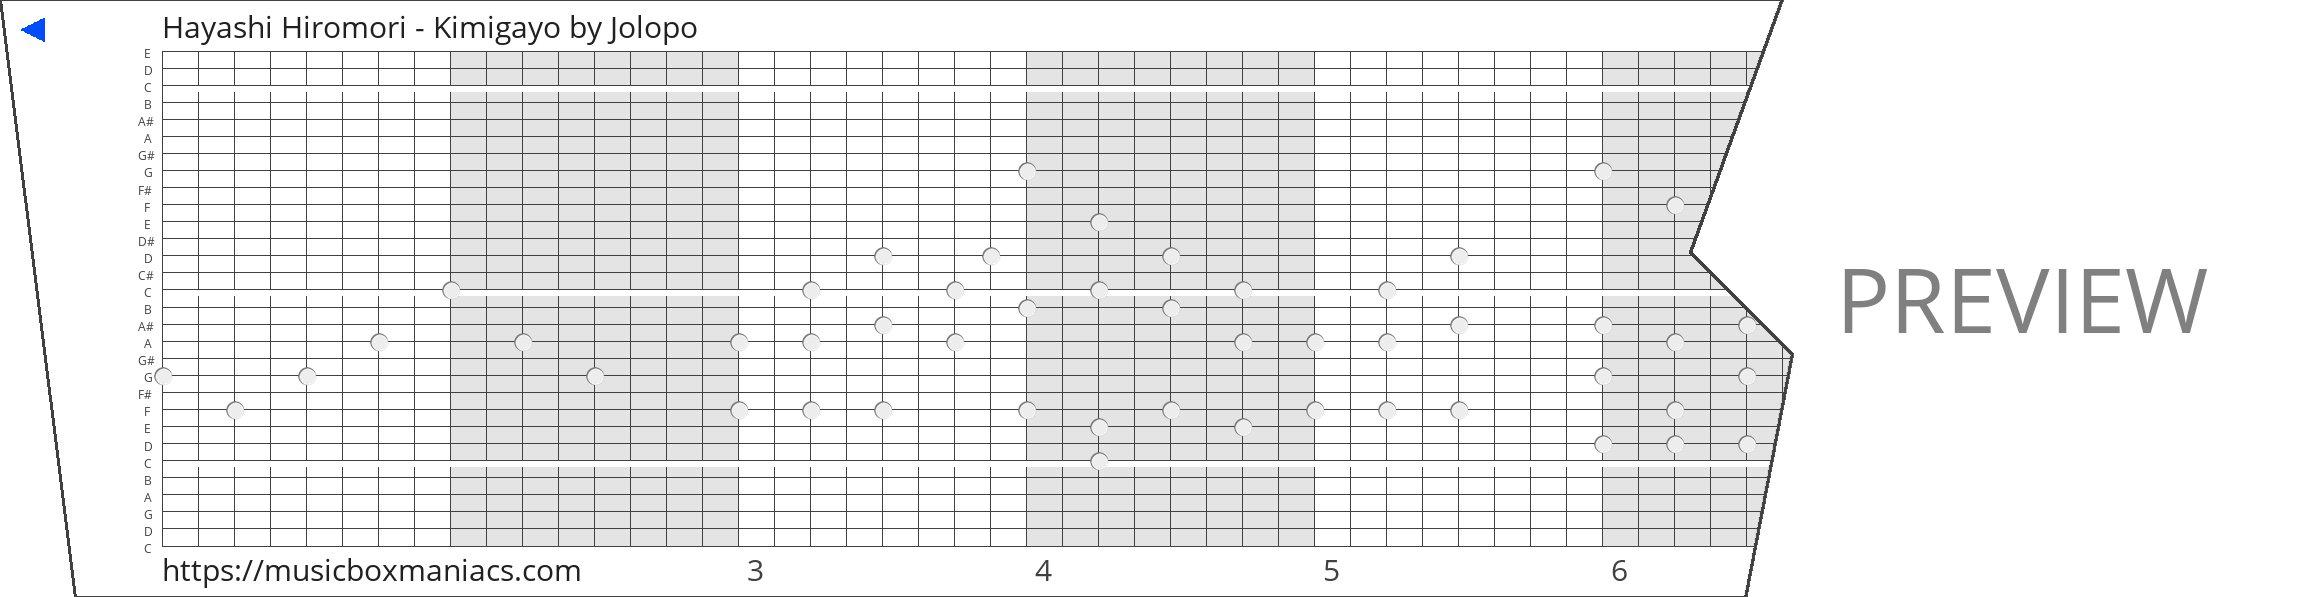 Hayashi Hiromori - Kimigayo 30 note music box paper strip